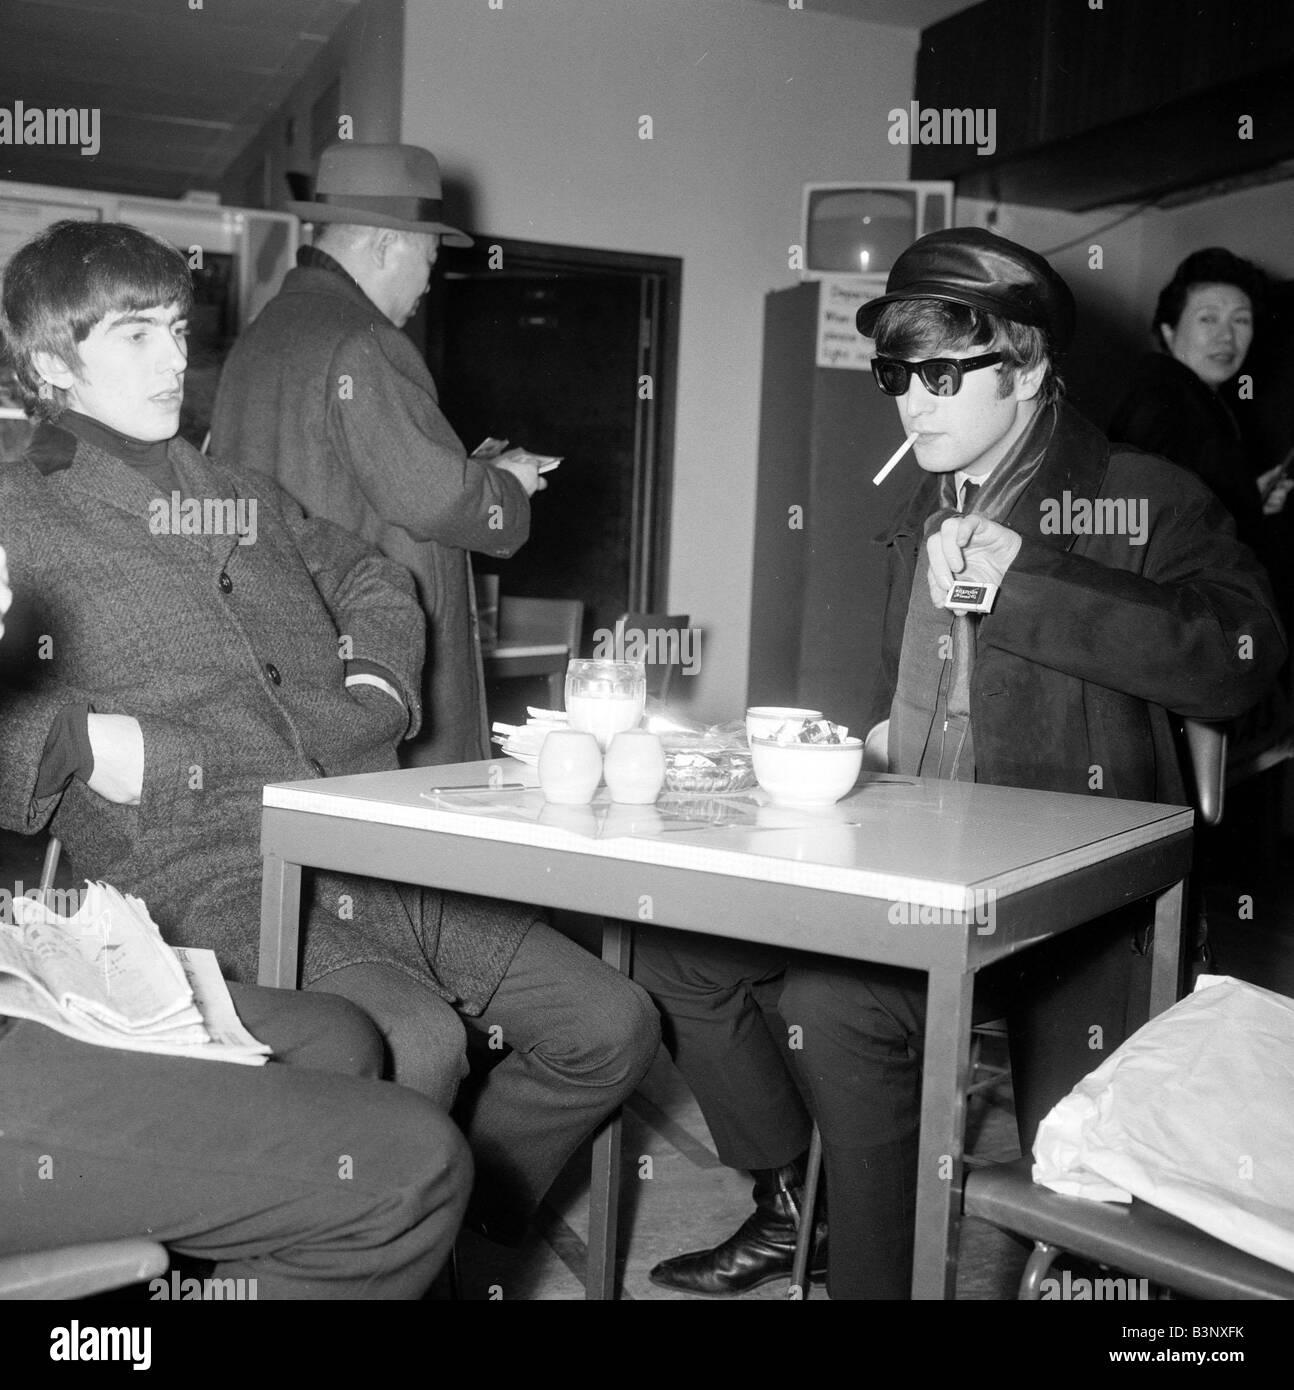 John Lennon and George Harrison of the Beatles pop group ...  John Lennon and...